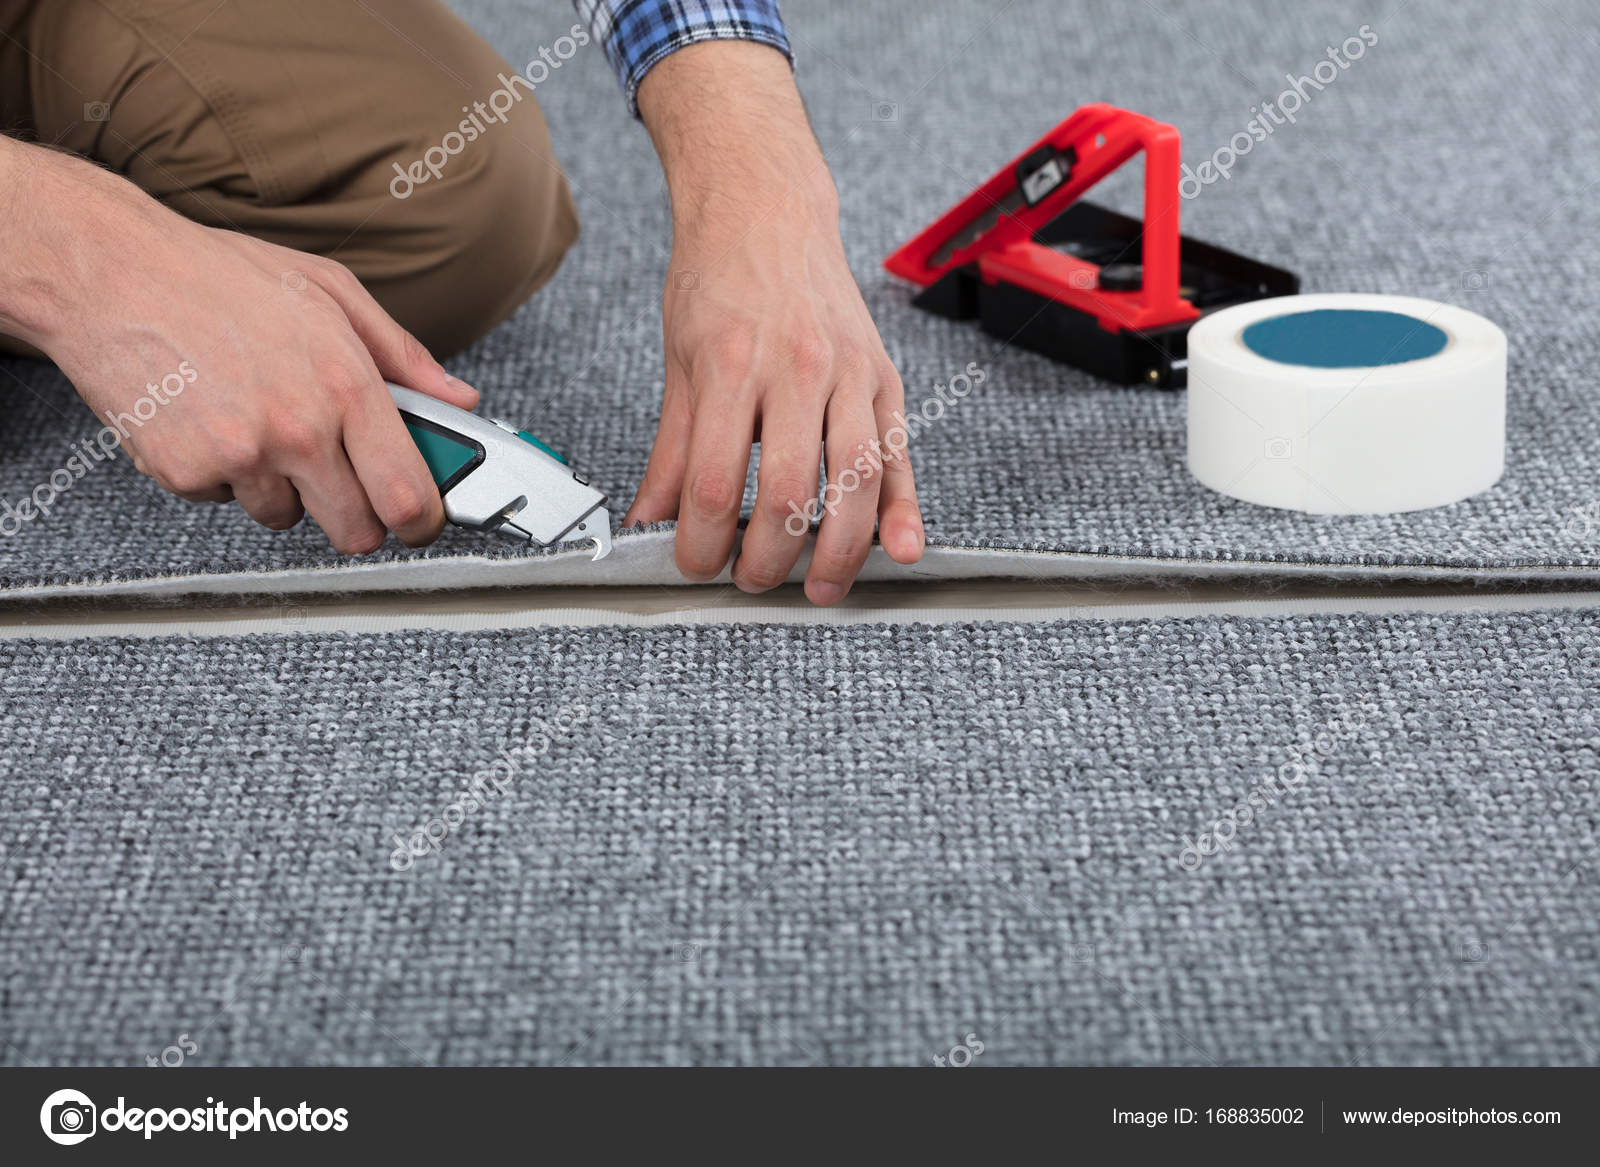 Timmerman tapijt leggen u2014 stockfoto © andreypopov #168835002